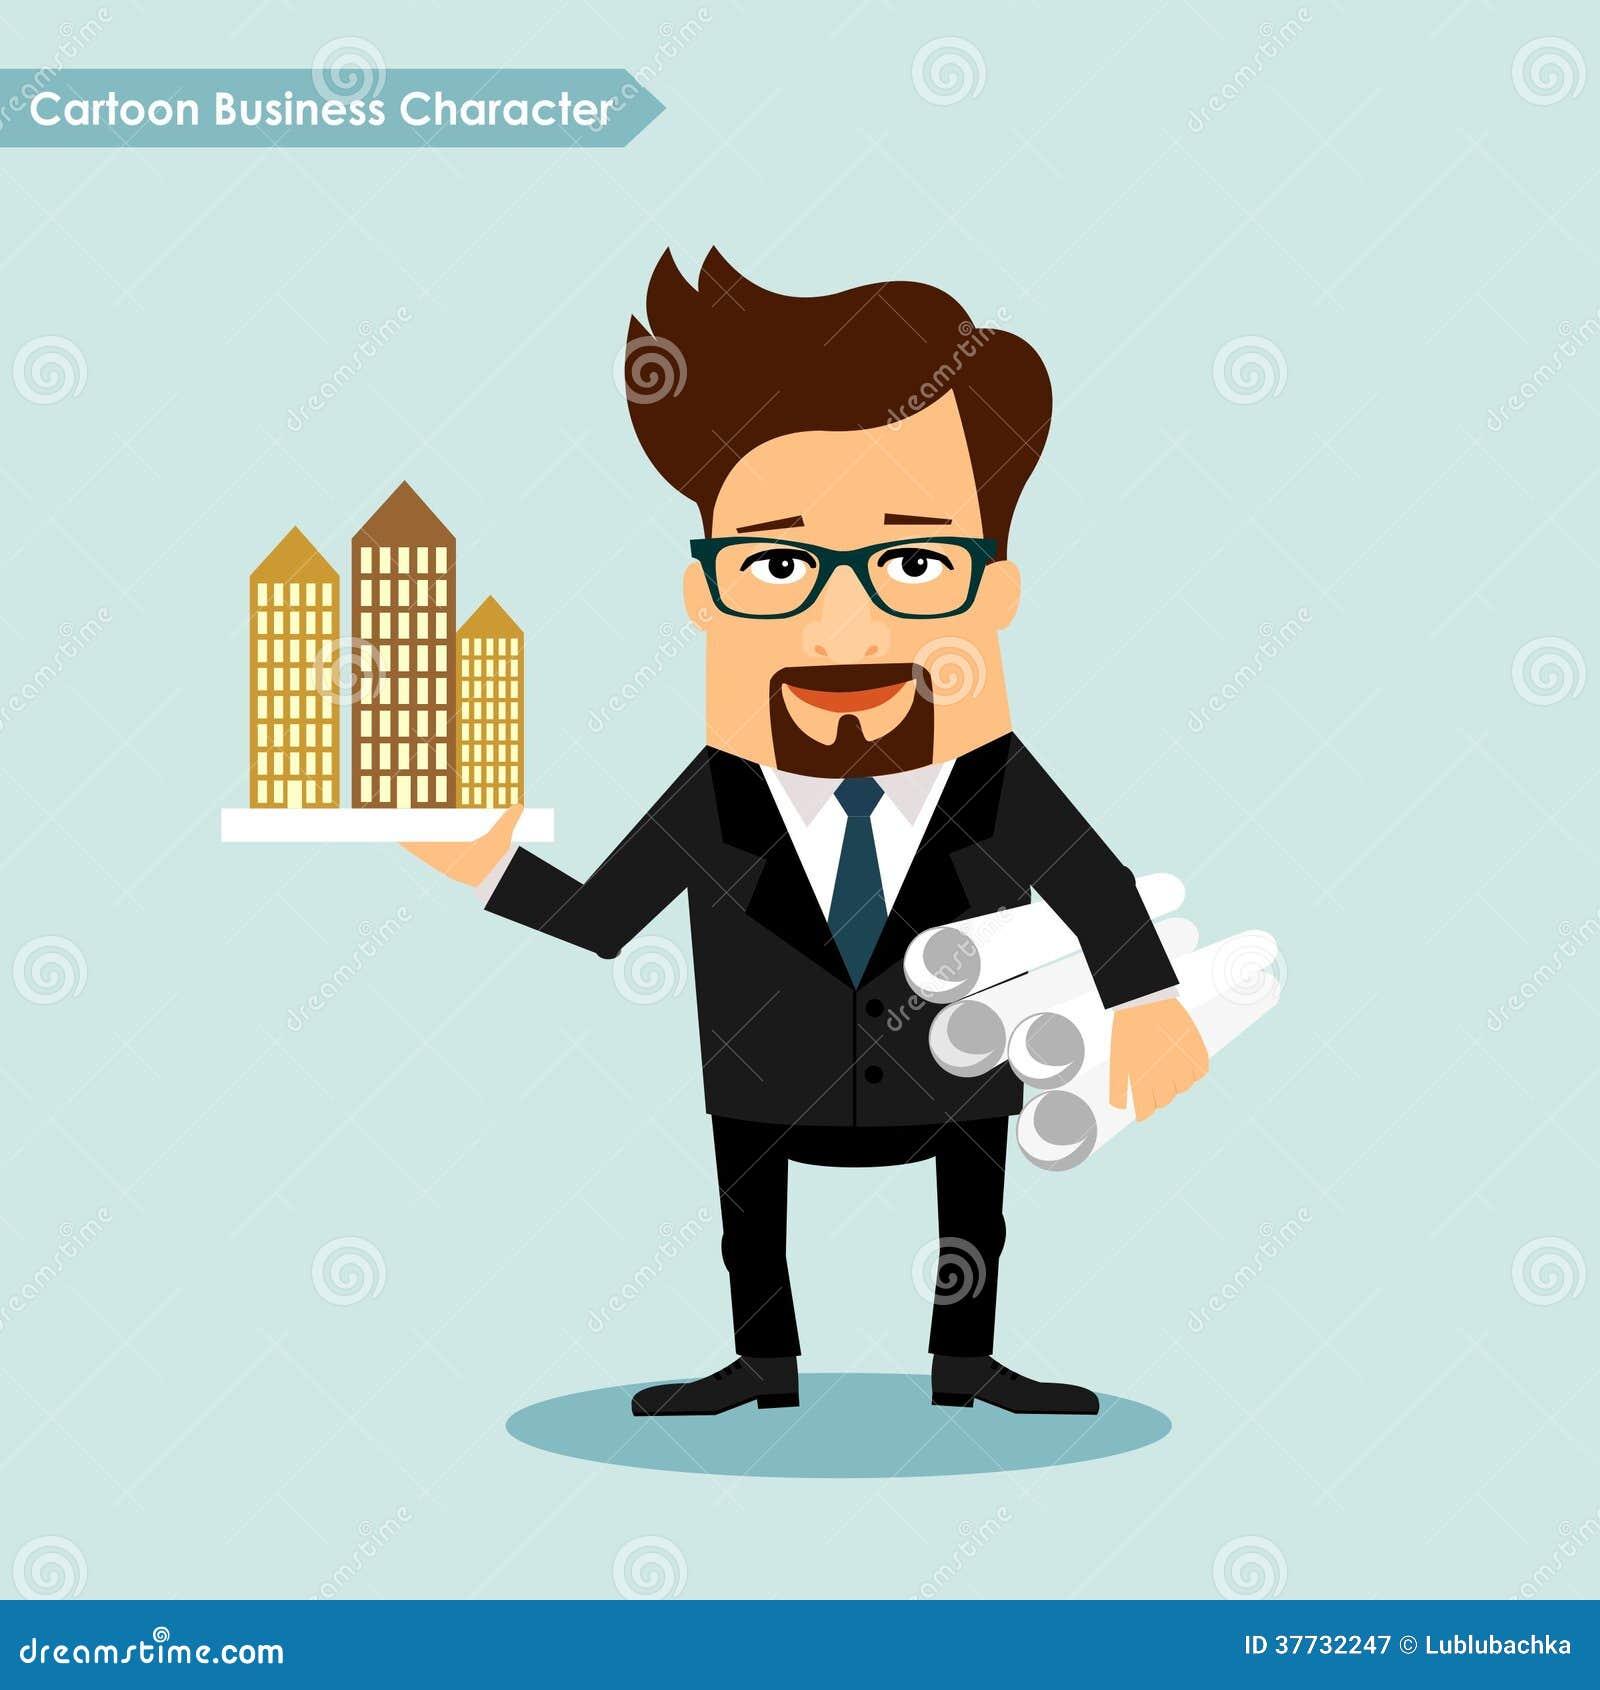 cartoon character architecture developer fumetto beeldverhaal carattere affari architettura sviluppatore building vector